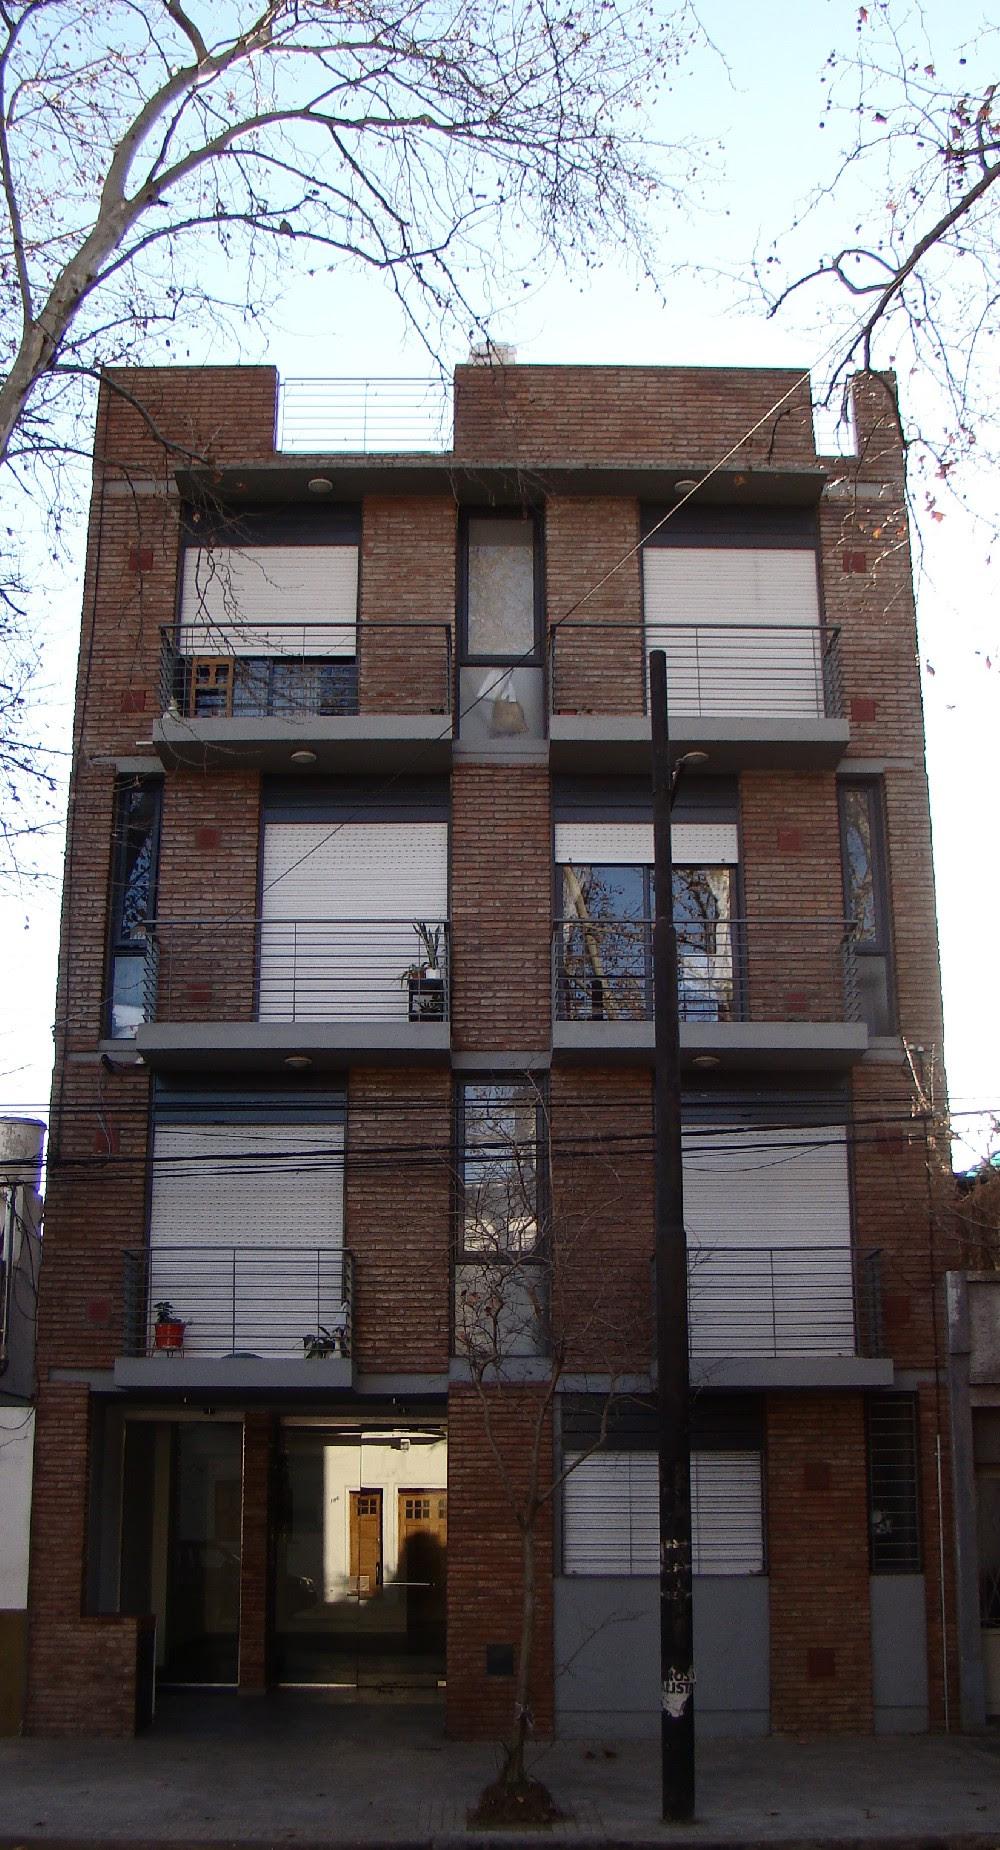 Edificio de vivienda san nicol s 338 fabrica de arquitectura y dise o tecno haus - Diseno de viviendas ...